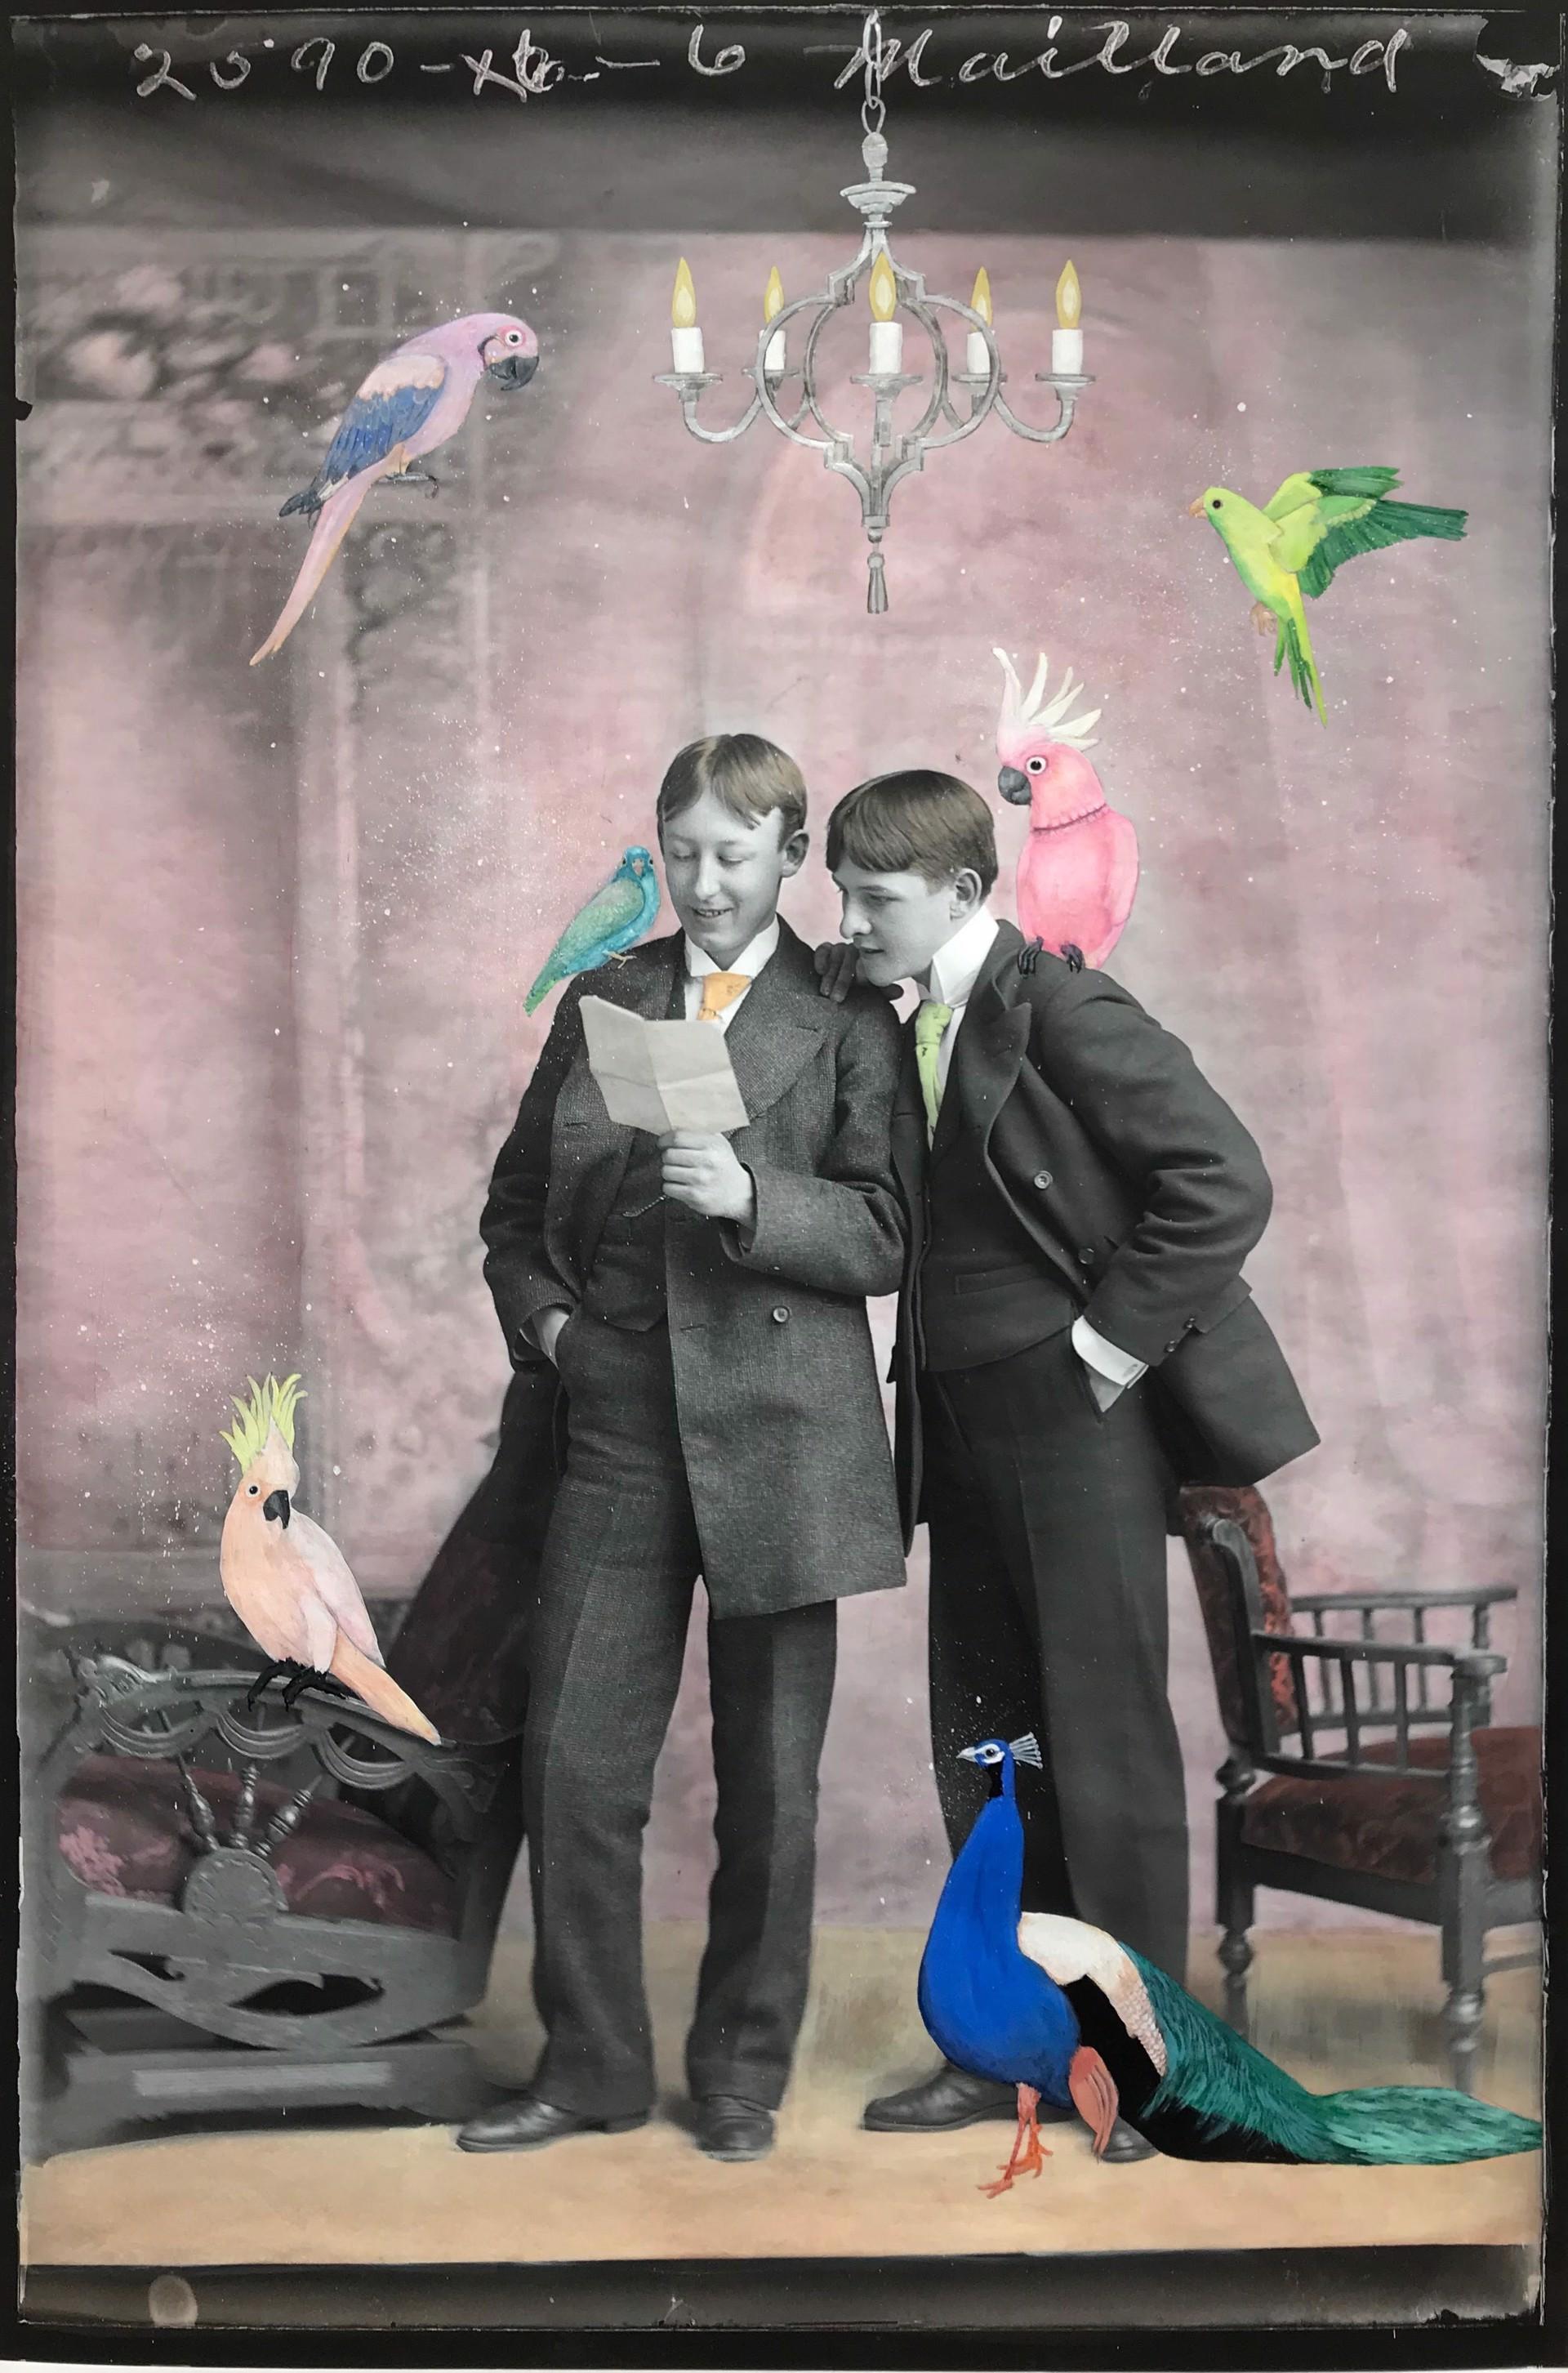 An Interest of Birds by Alexandra Eldridge